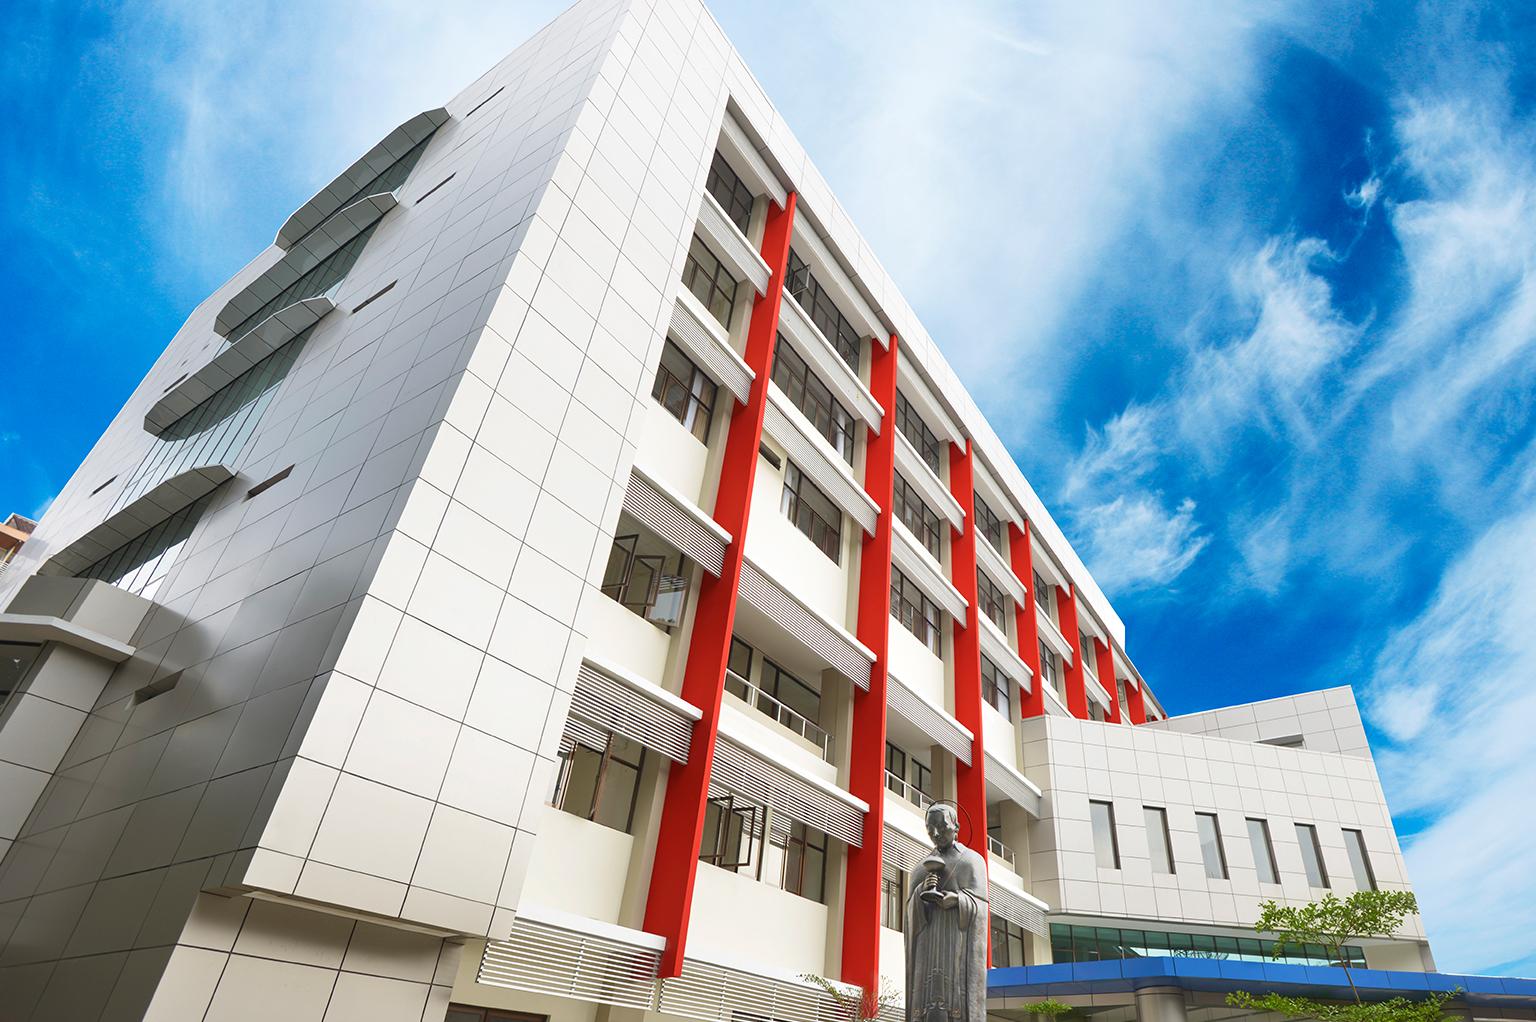 gambar rumah sakit santo boromeus Rumah Sakit Terbesar Di Bandung